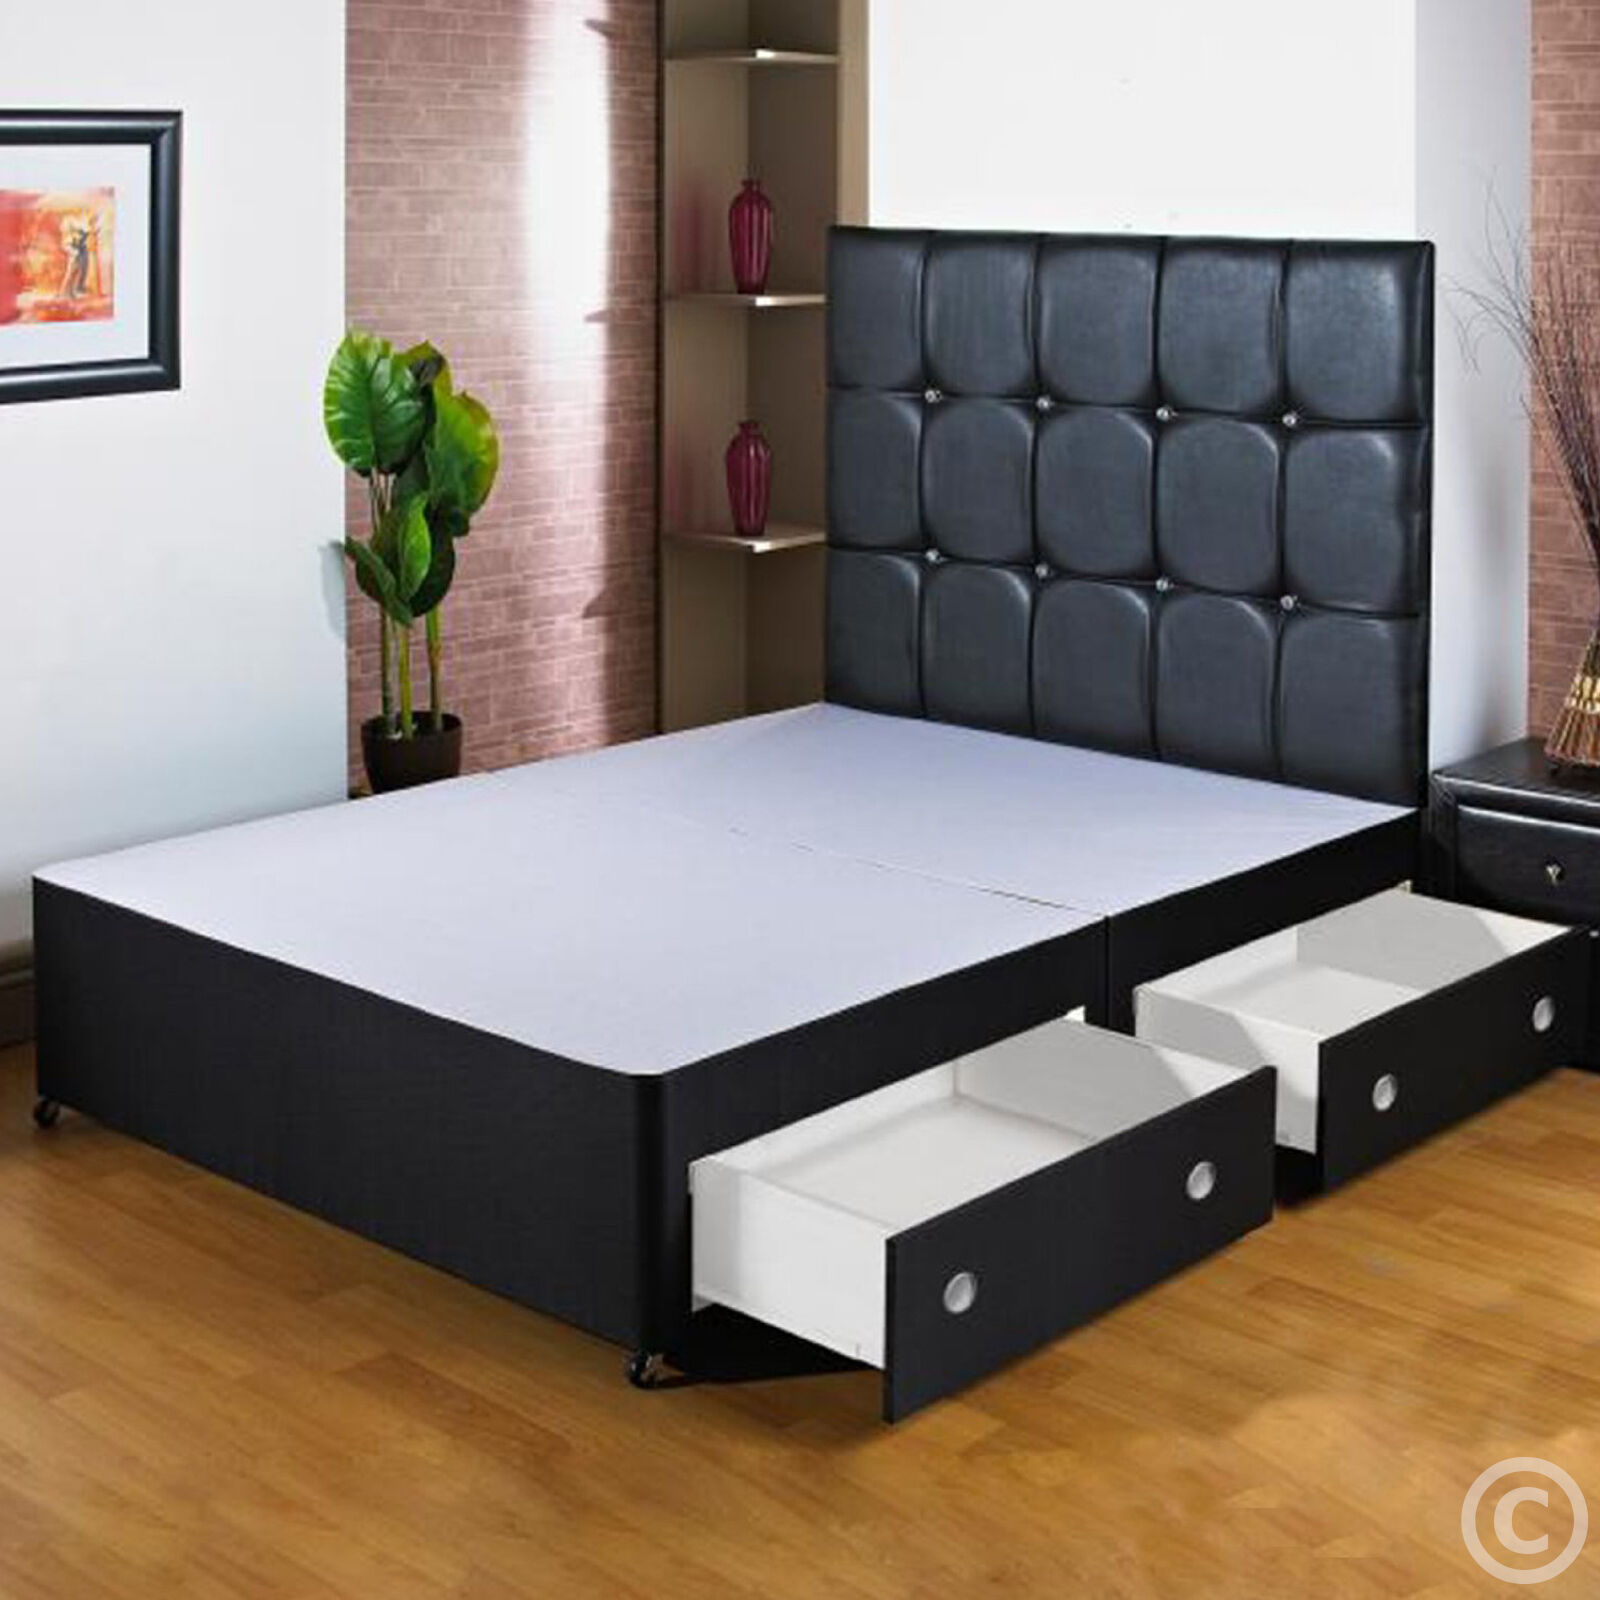 New 4ft 6 Quot Double Black Divan Bed Base Storage Drawers